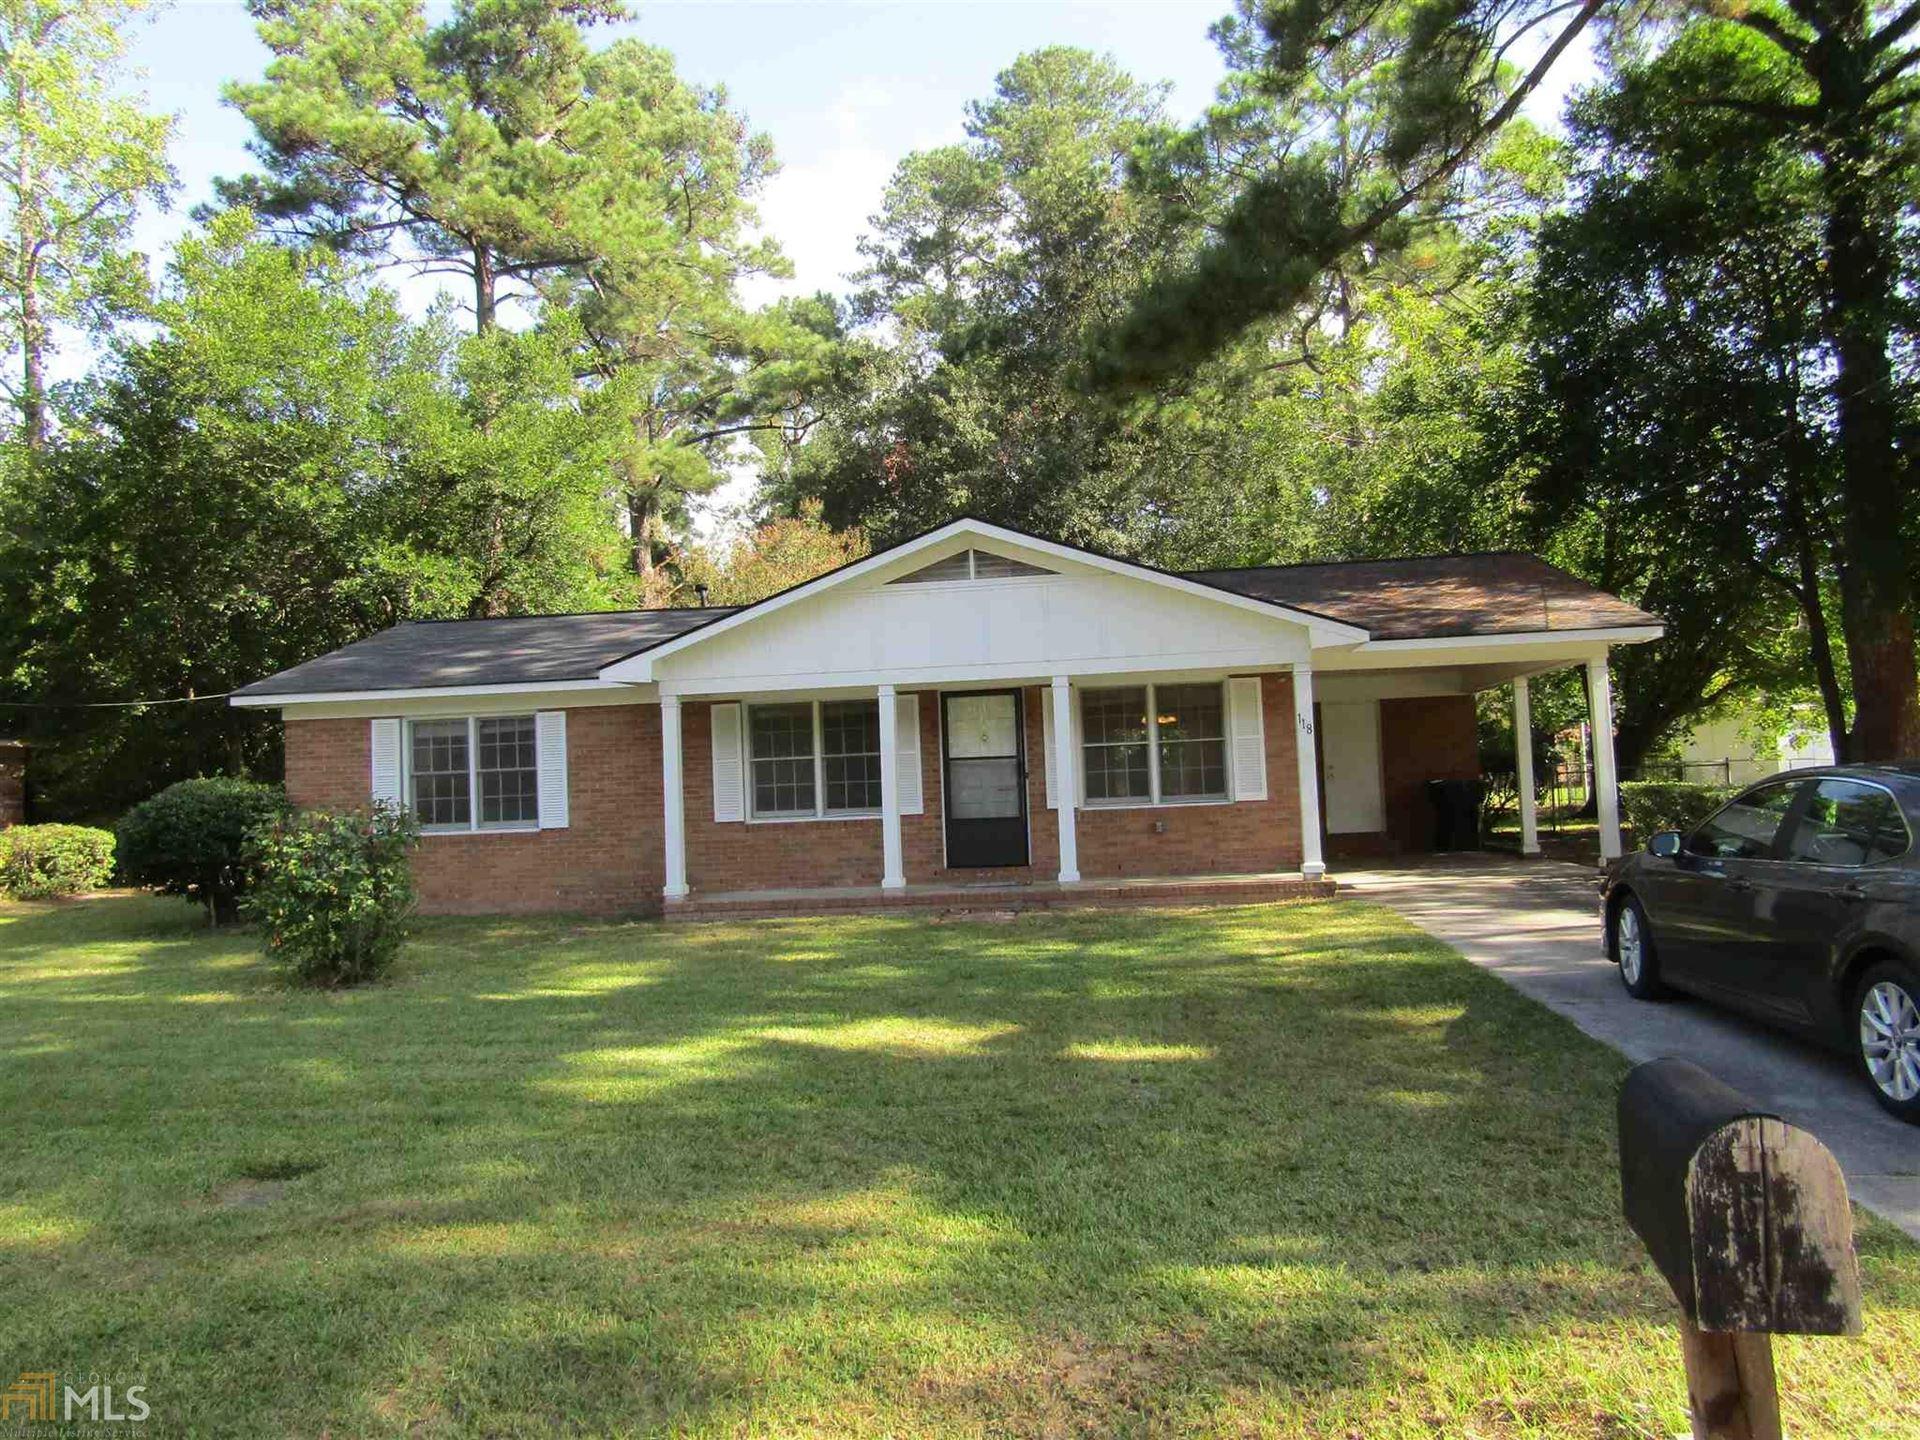 118 Gentilly Dr, Statesboro, GA 30458 - #: 8863260